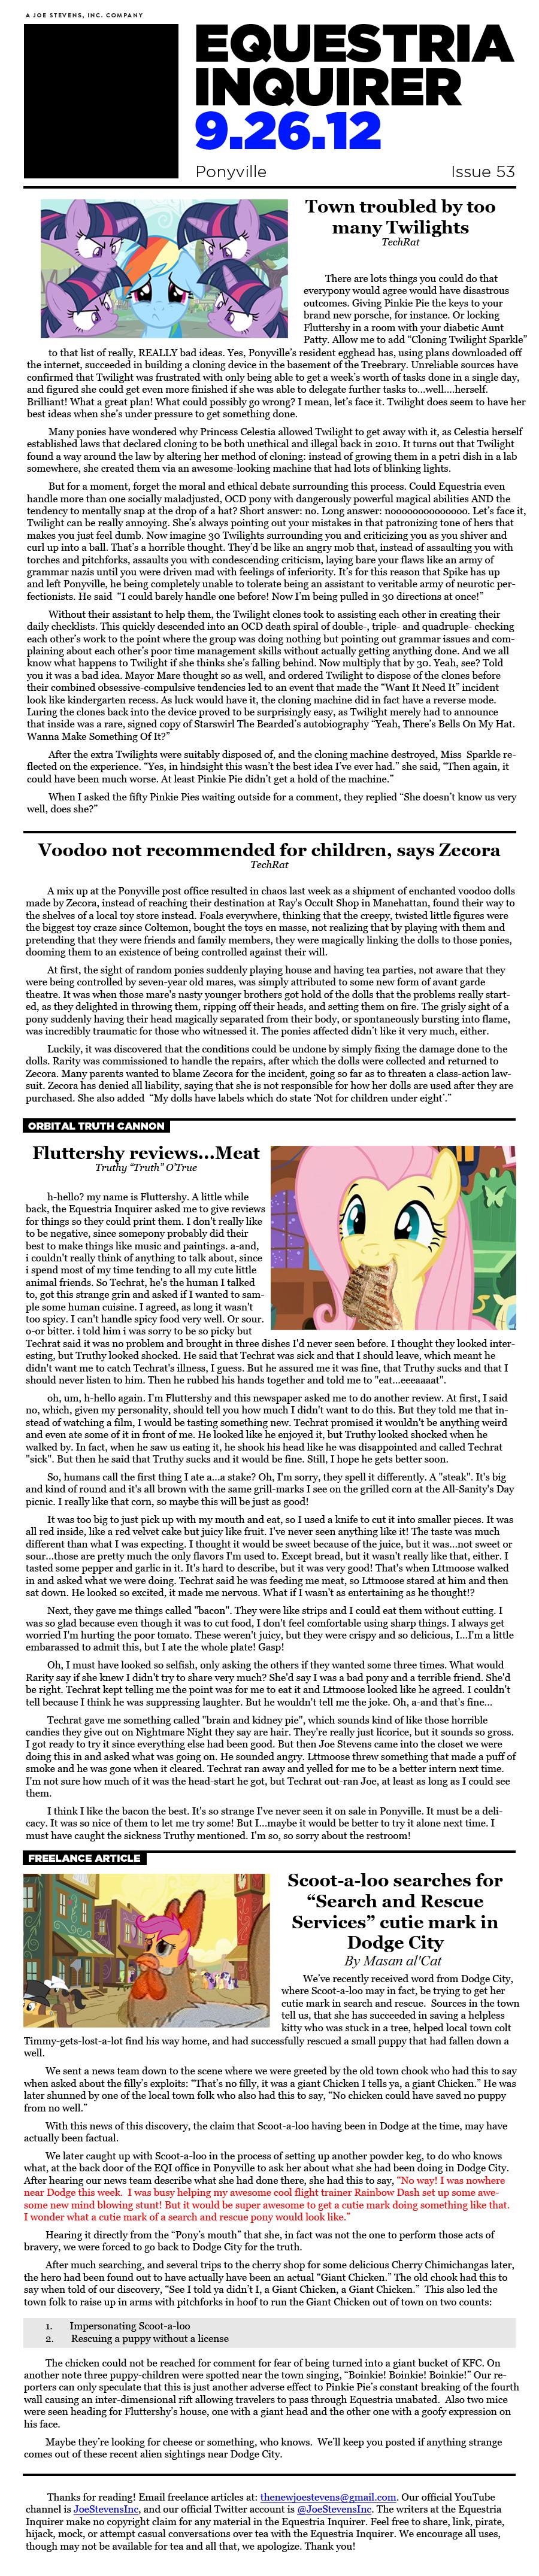 Equestria Inquirer 53 by JoeStevensInc